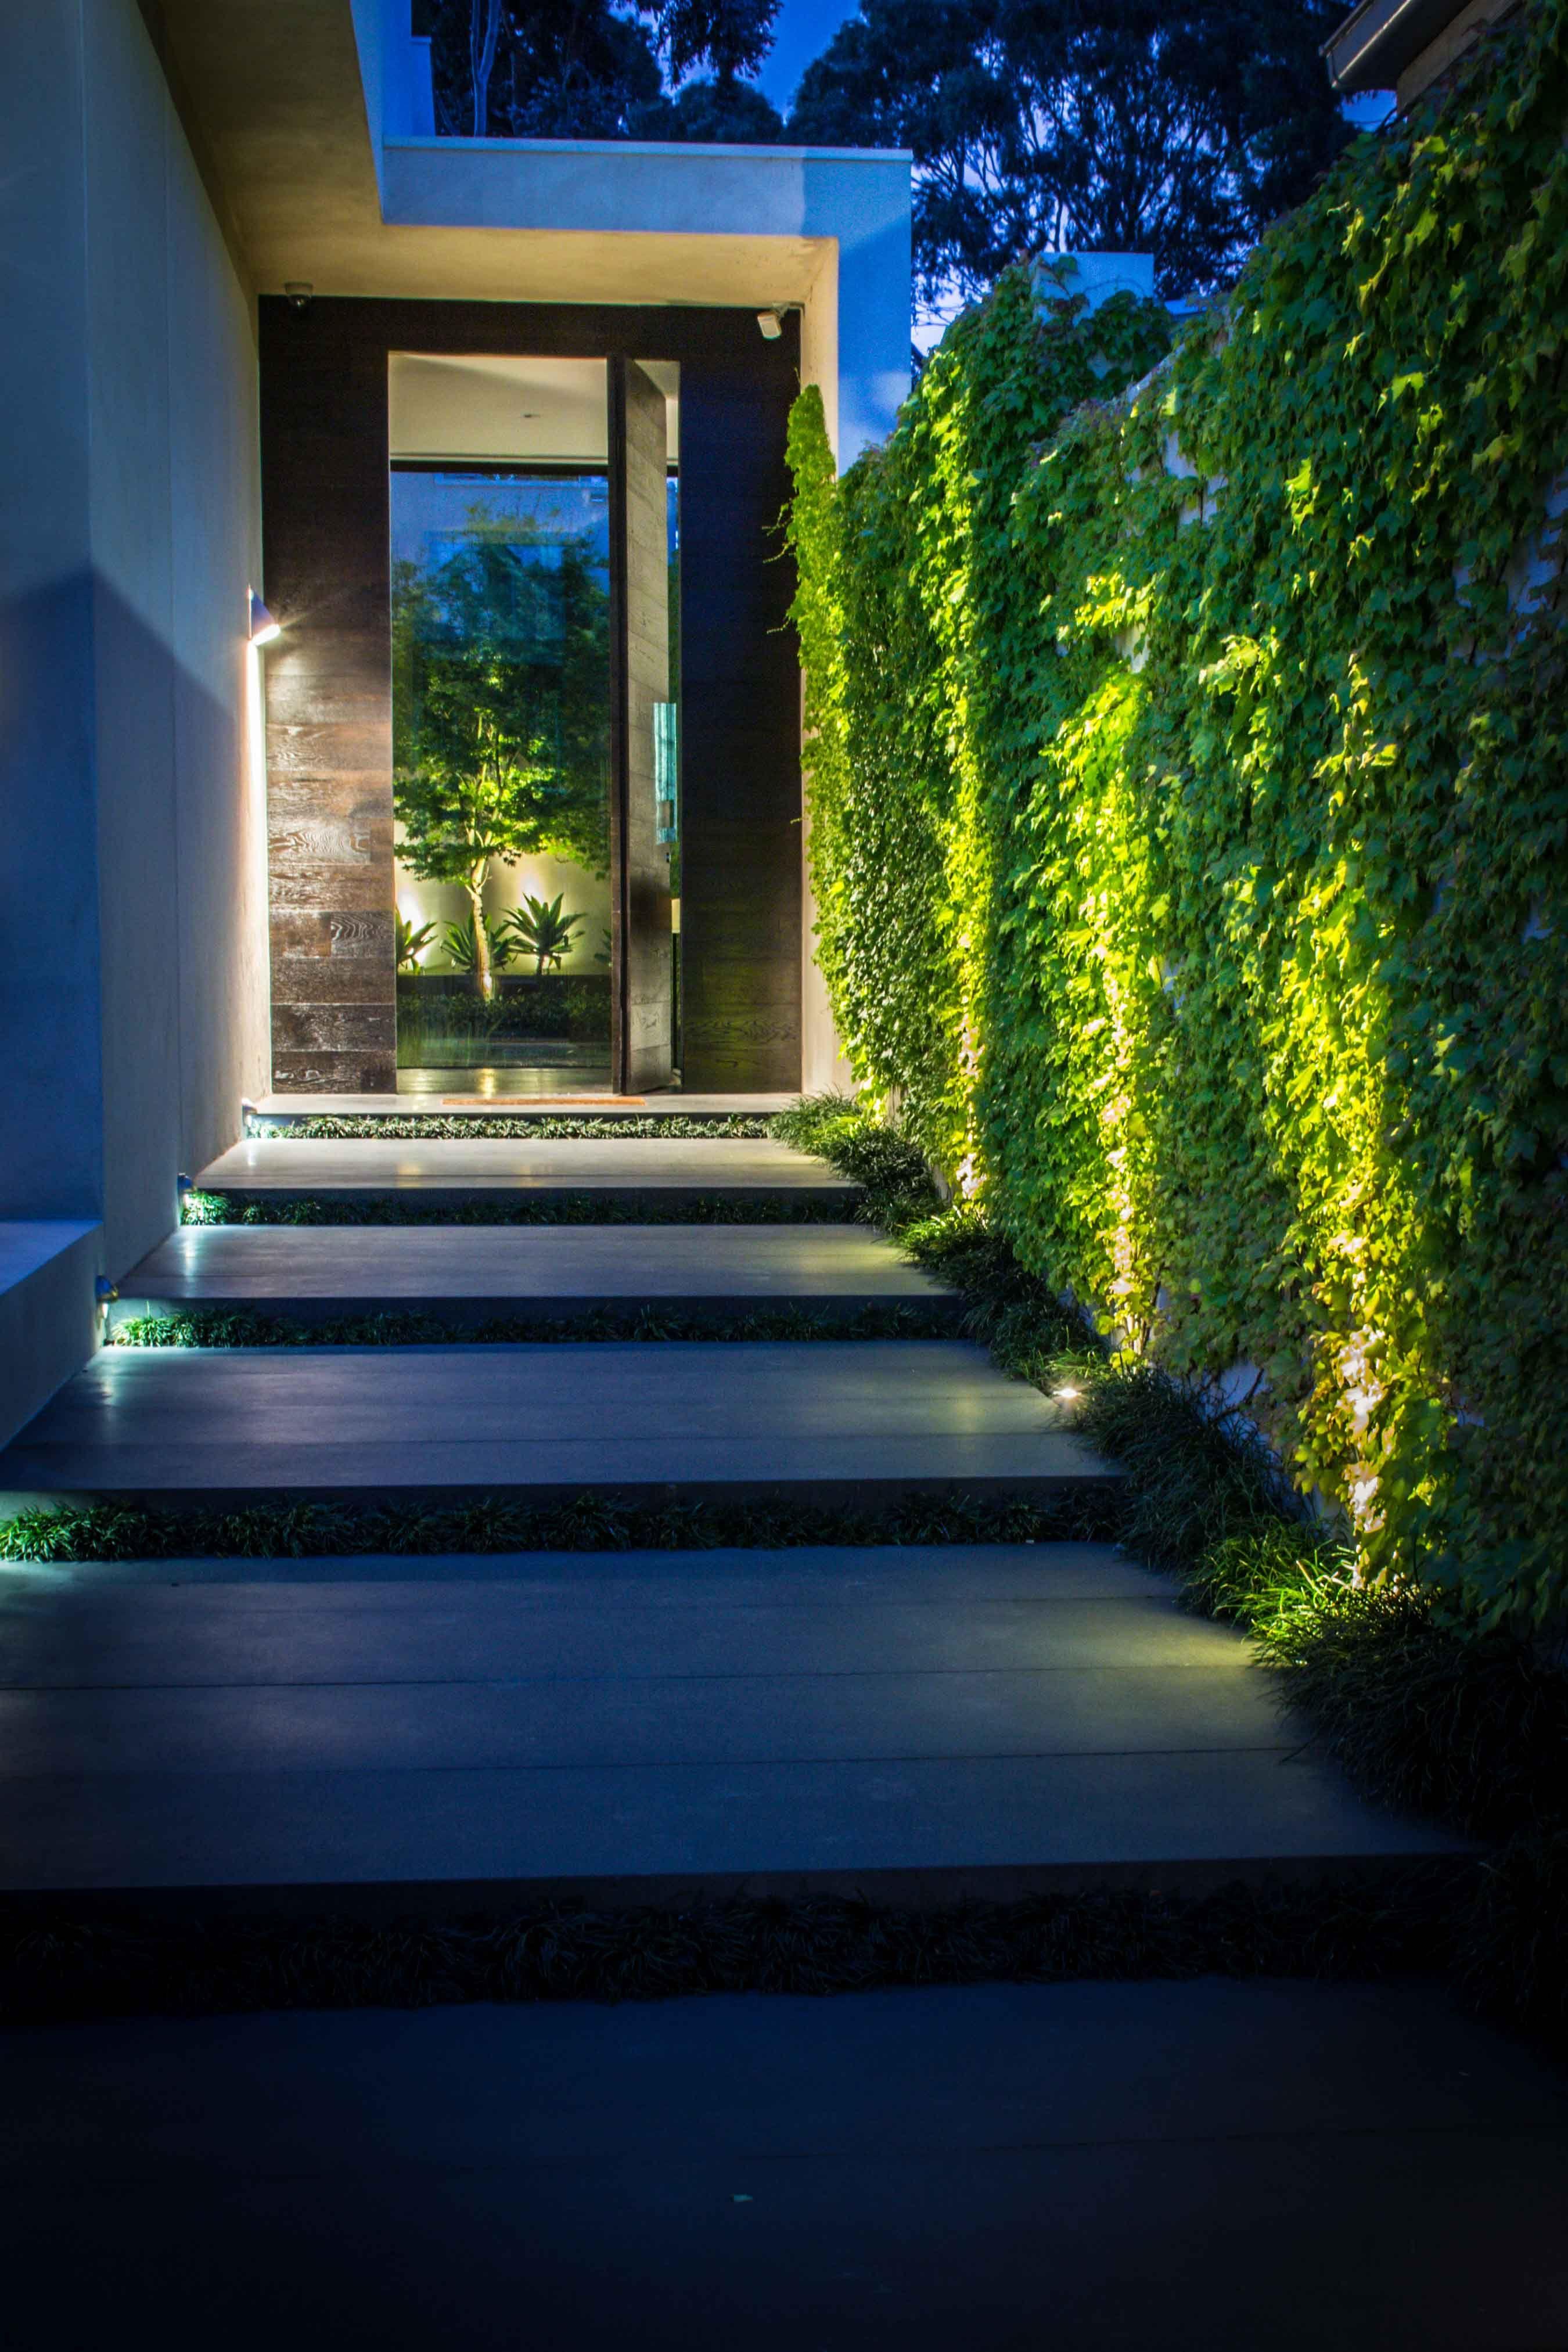 Spring Road Ben Scott Garden Design (With images